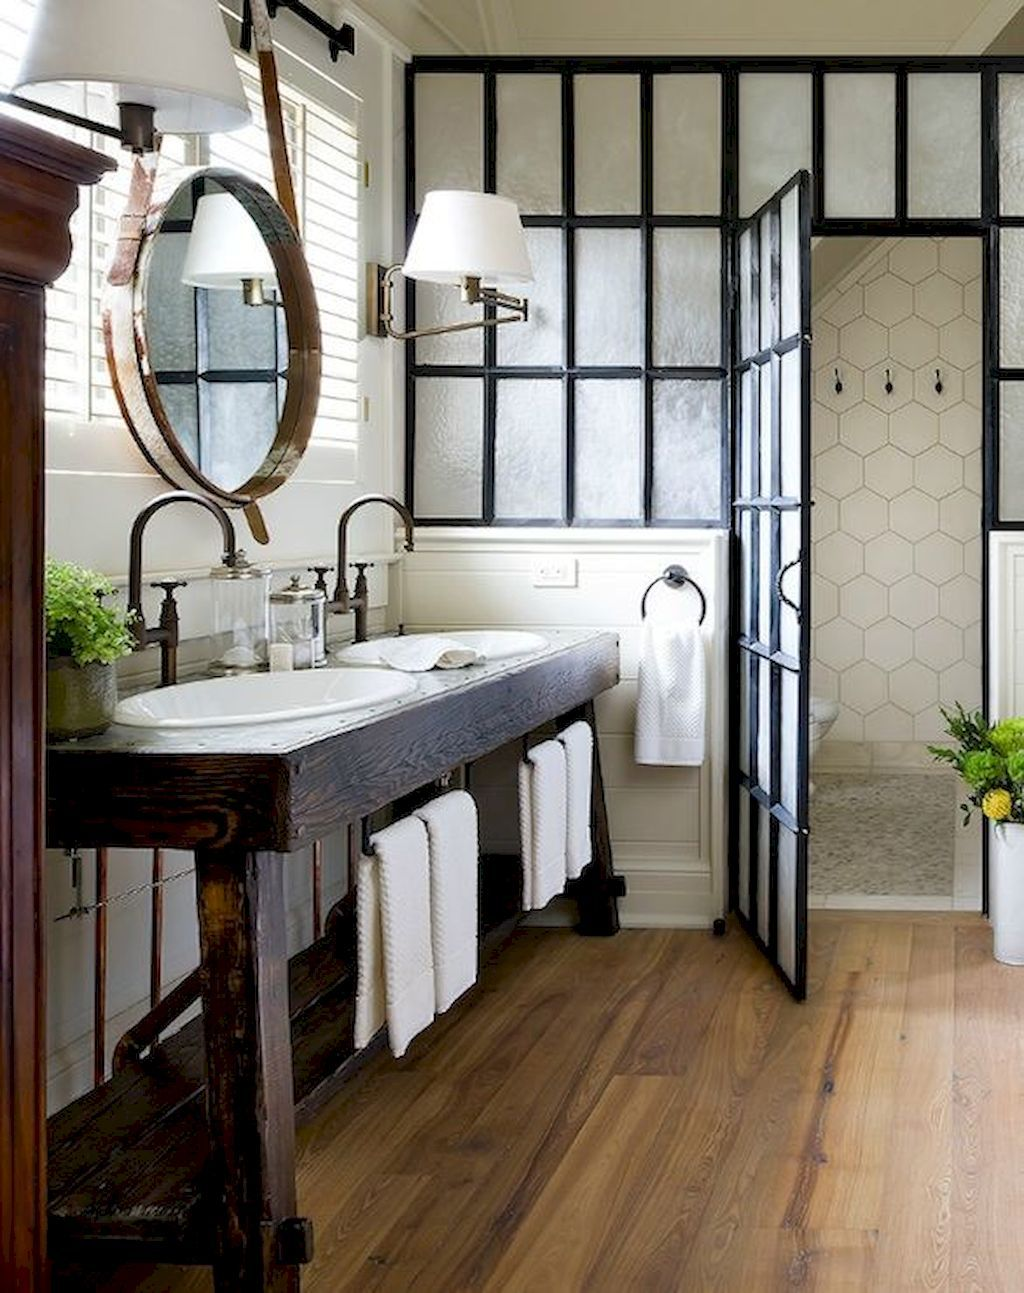 Adorable 105 Awesome Modern Farmhouse Bathroom Decor